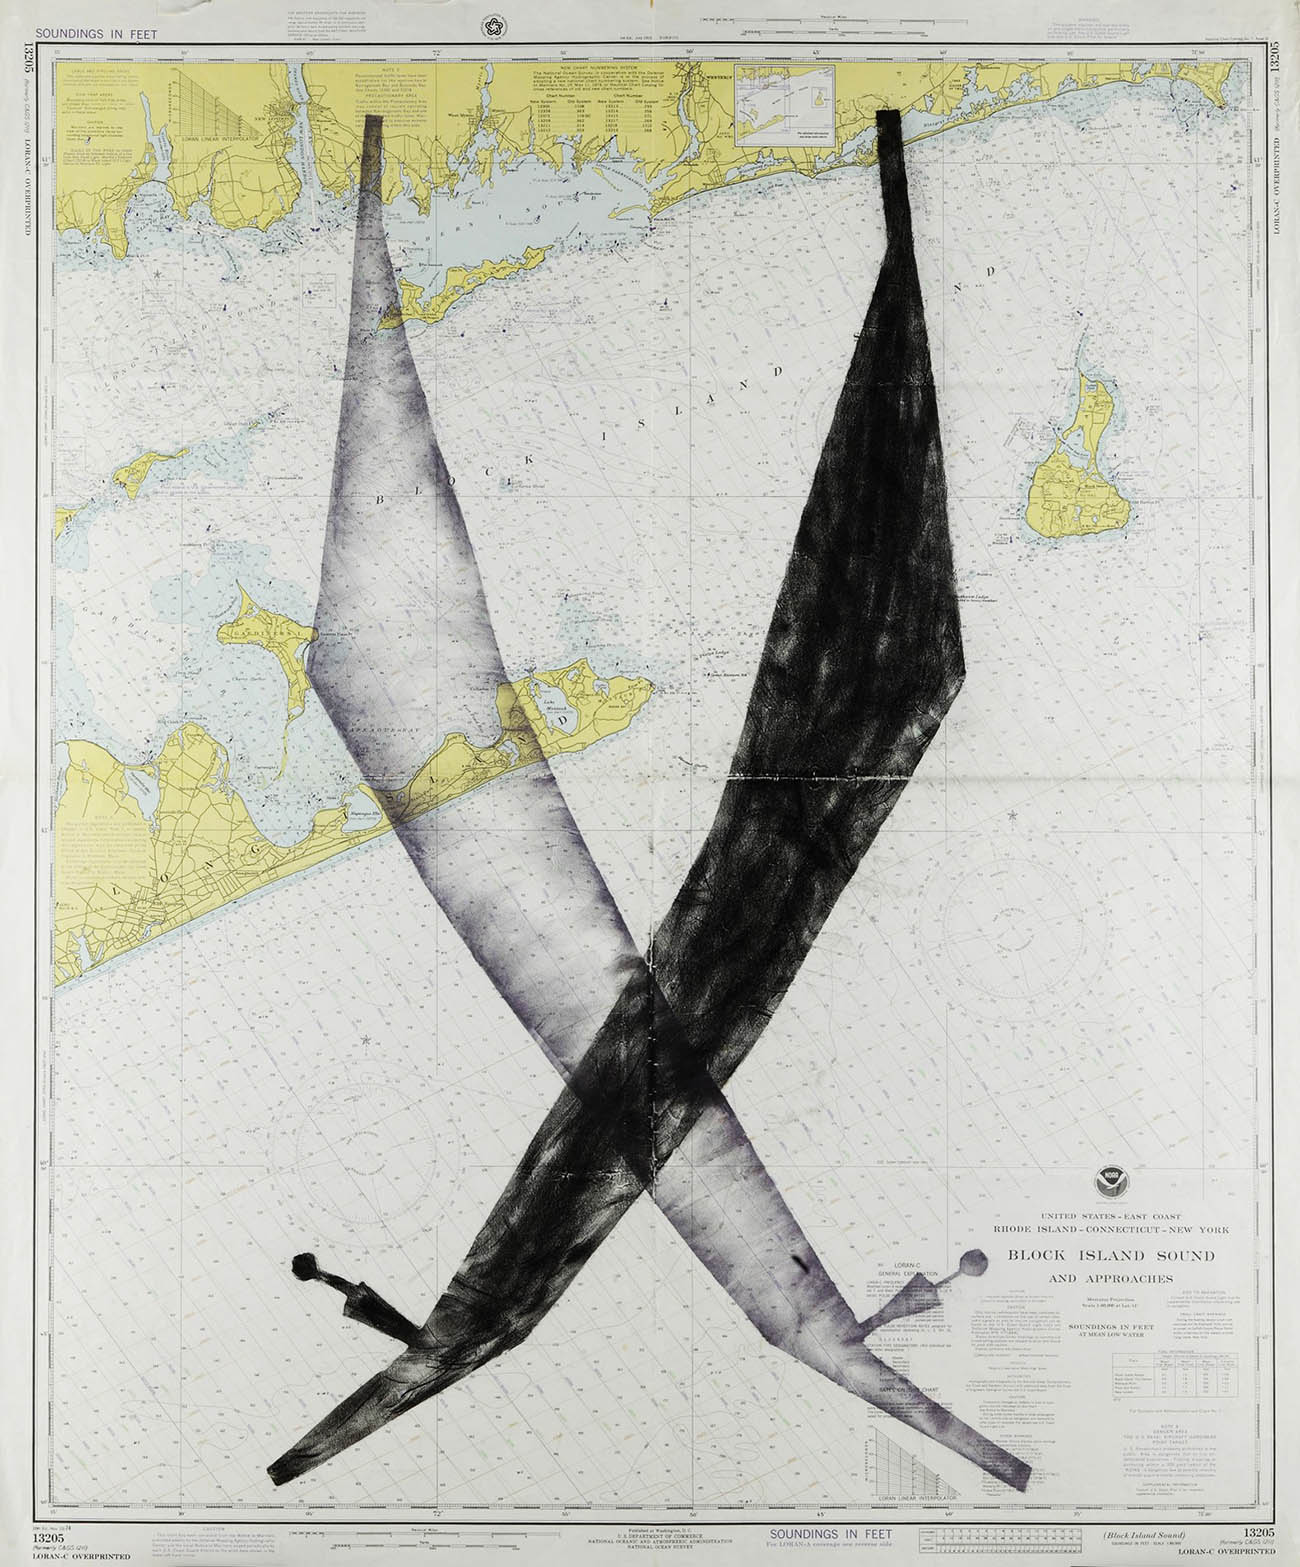 Block Island - 110x90cm - €750